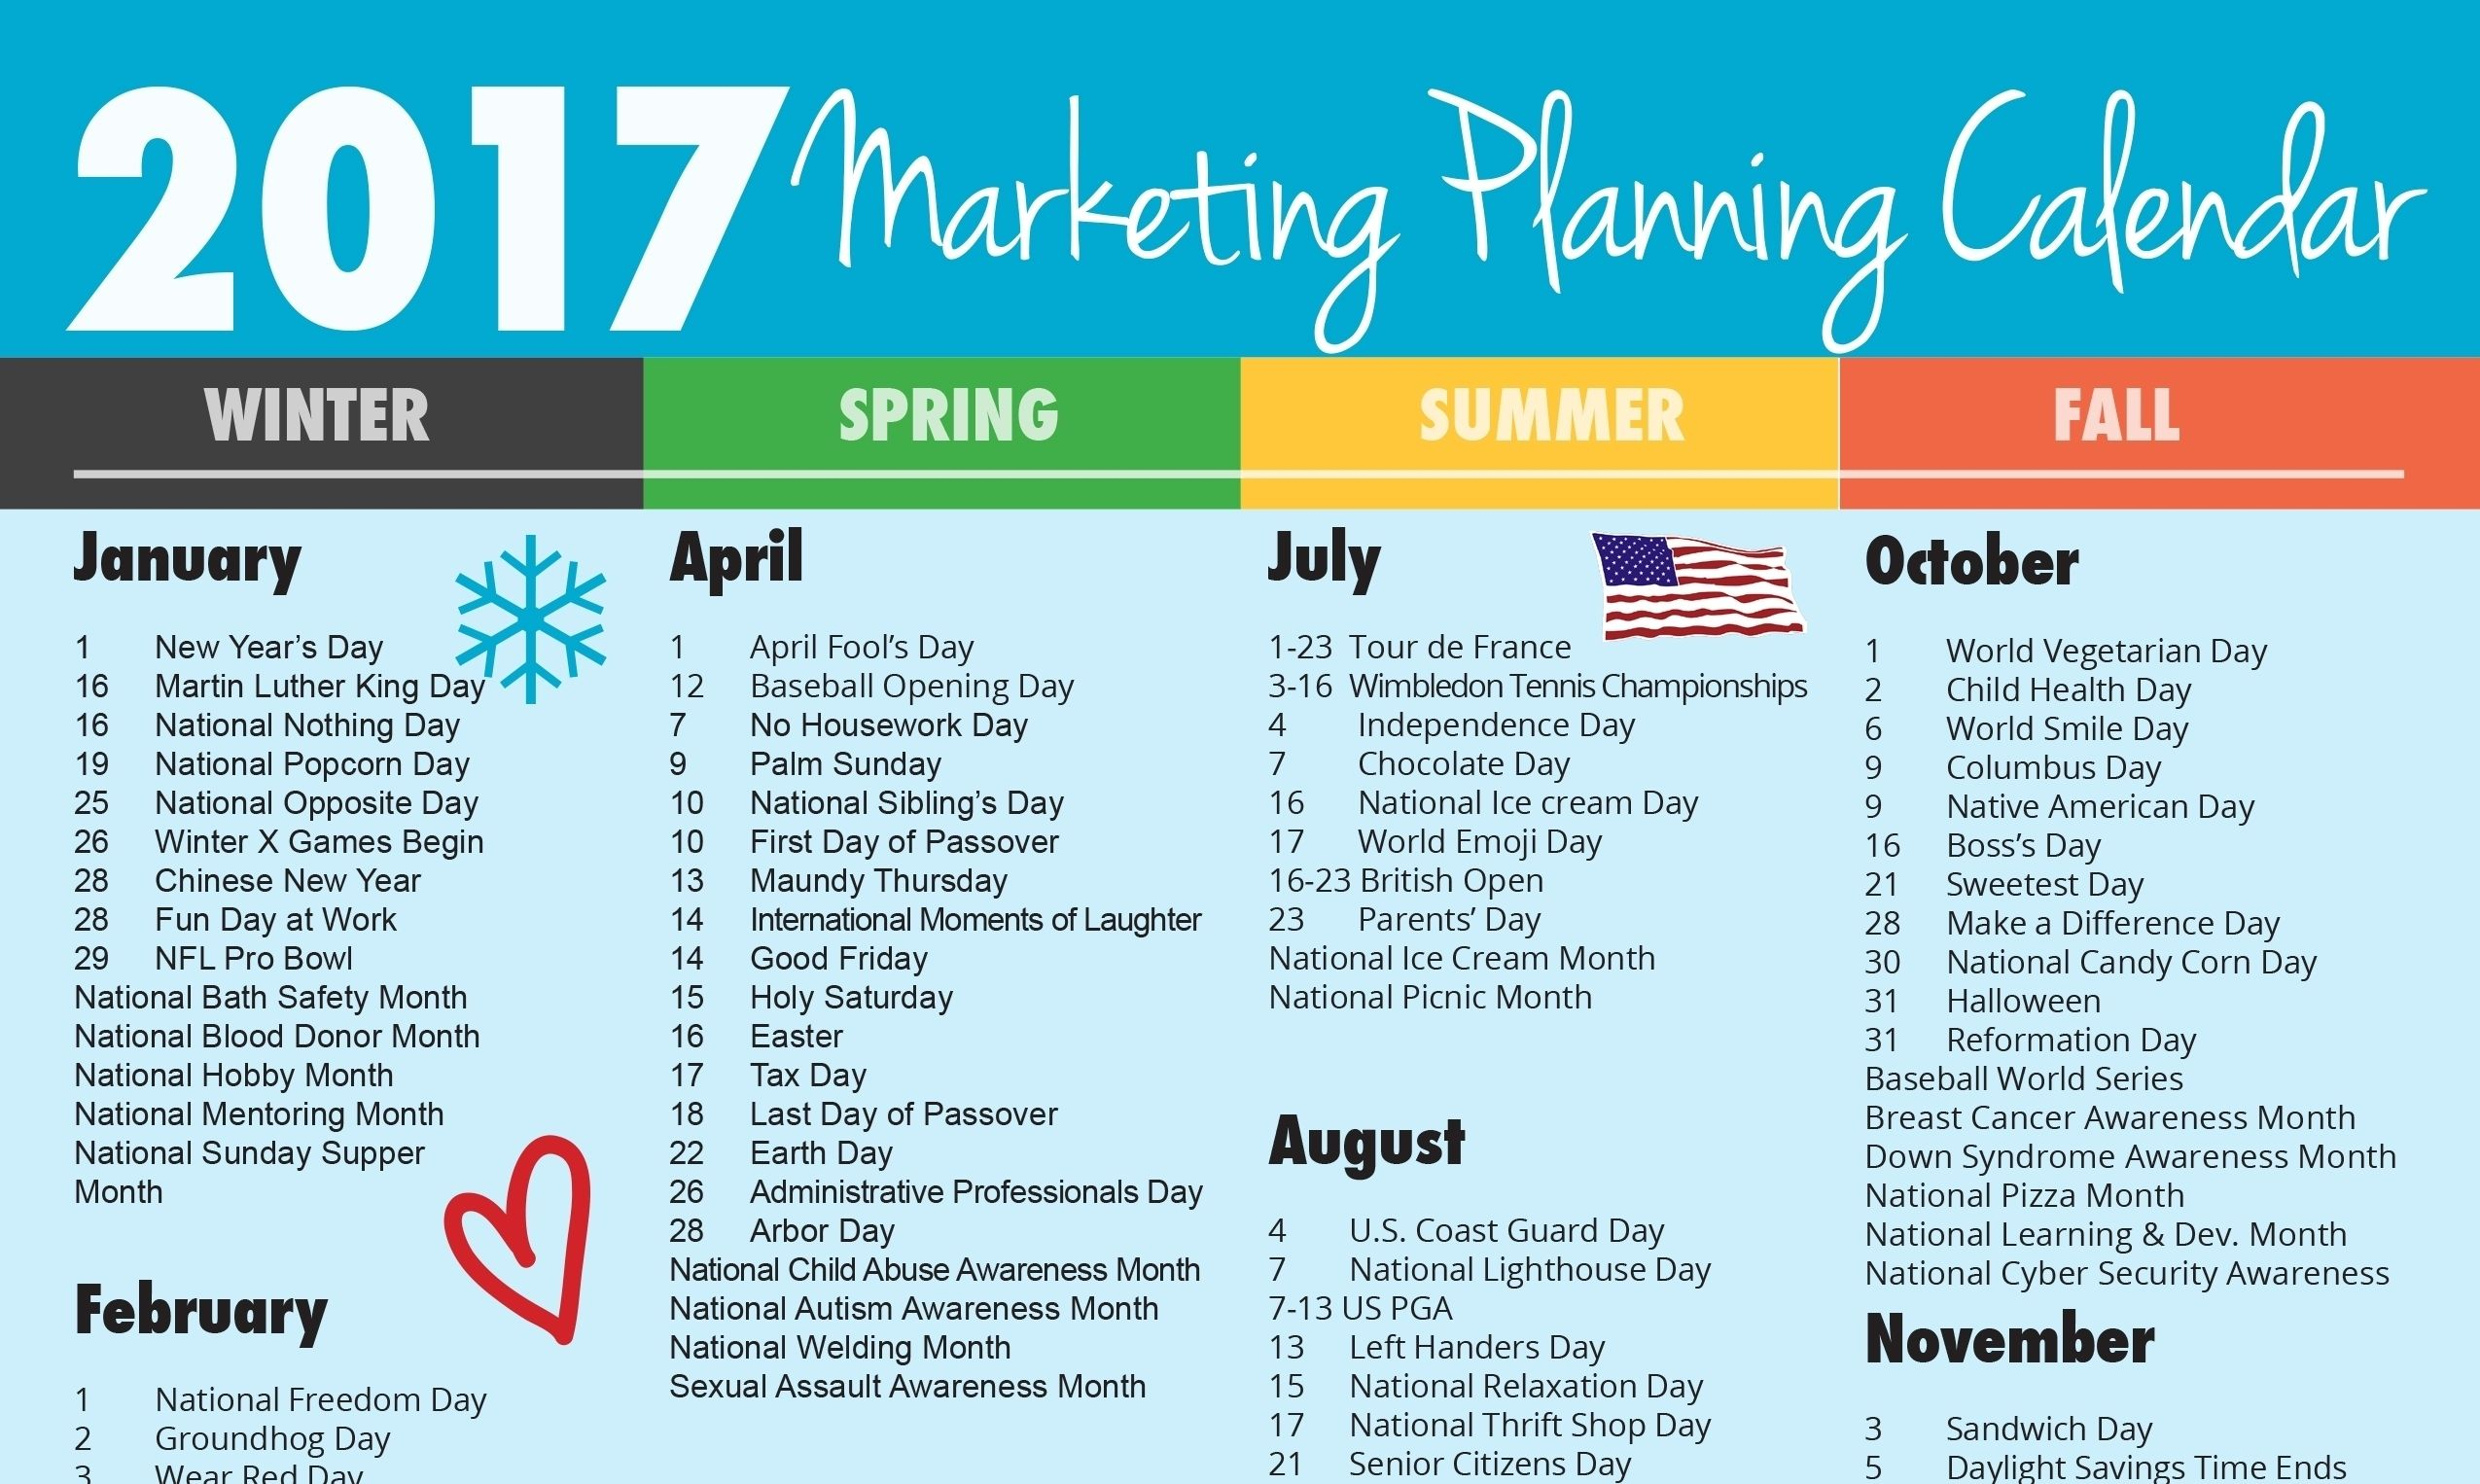 Year Calendar Of National Days | Marketing Planning Calendar